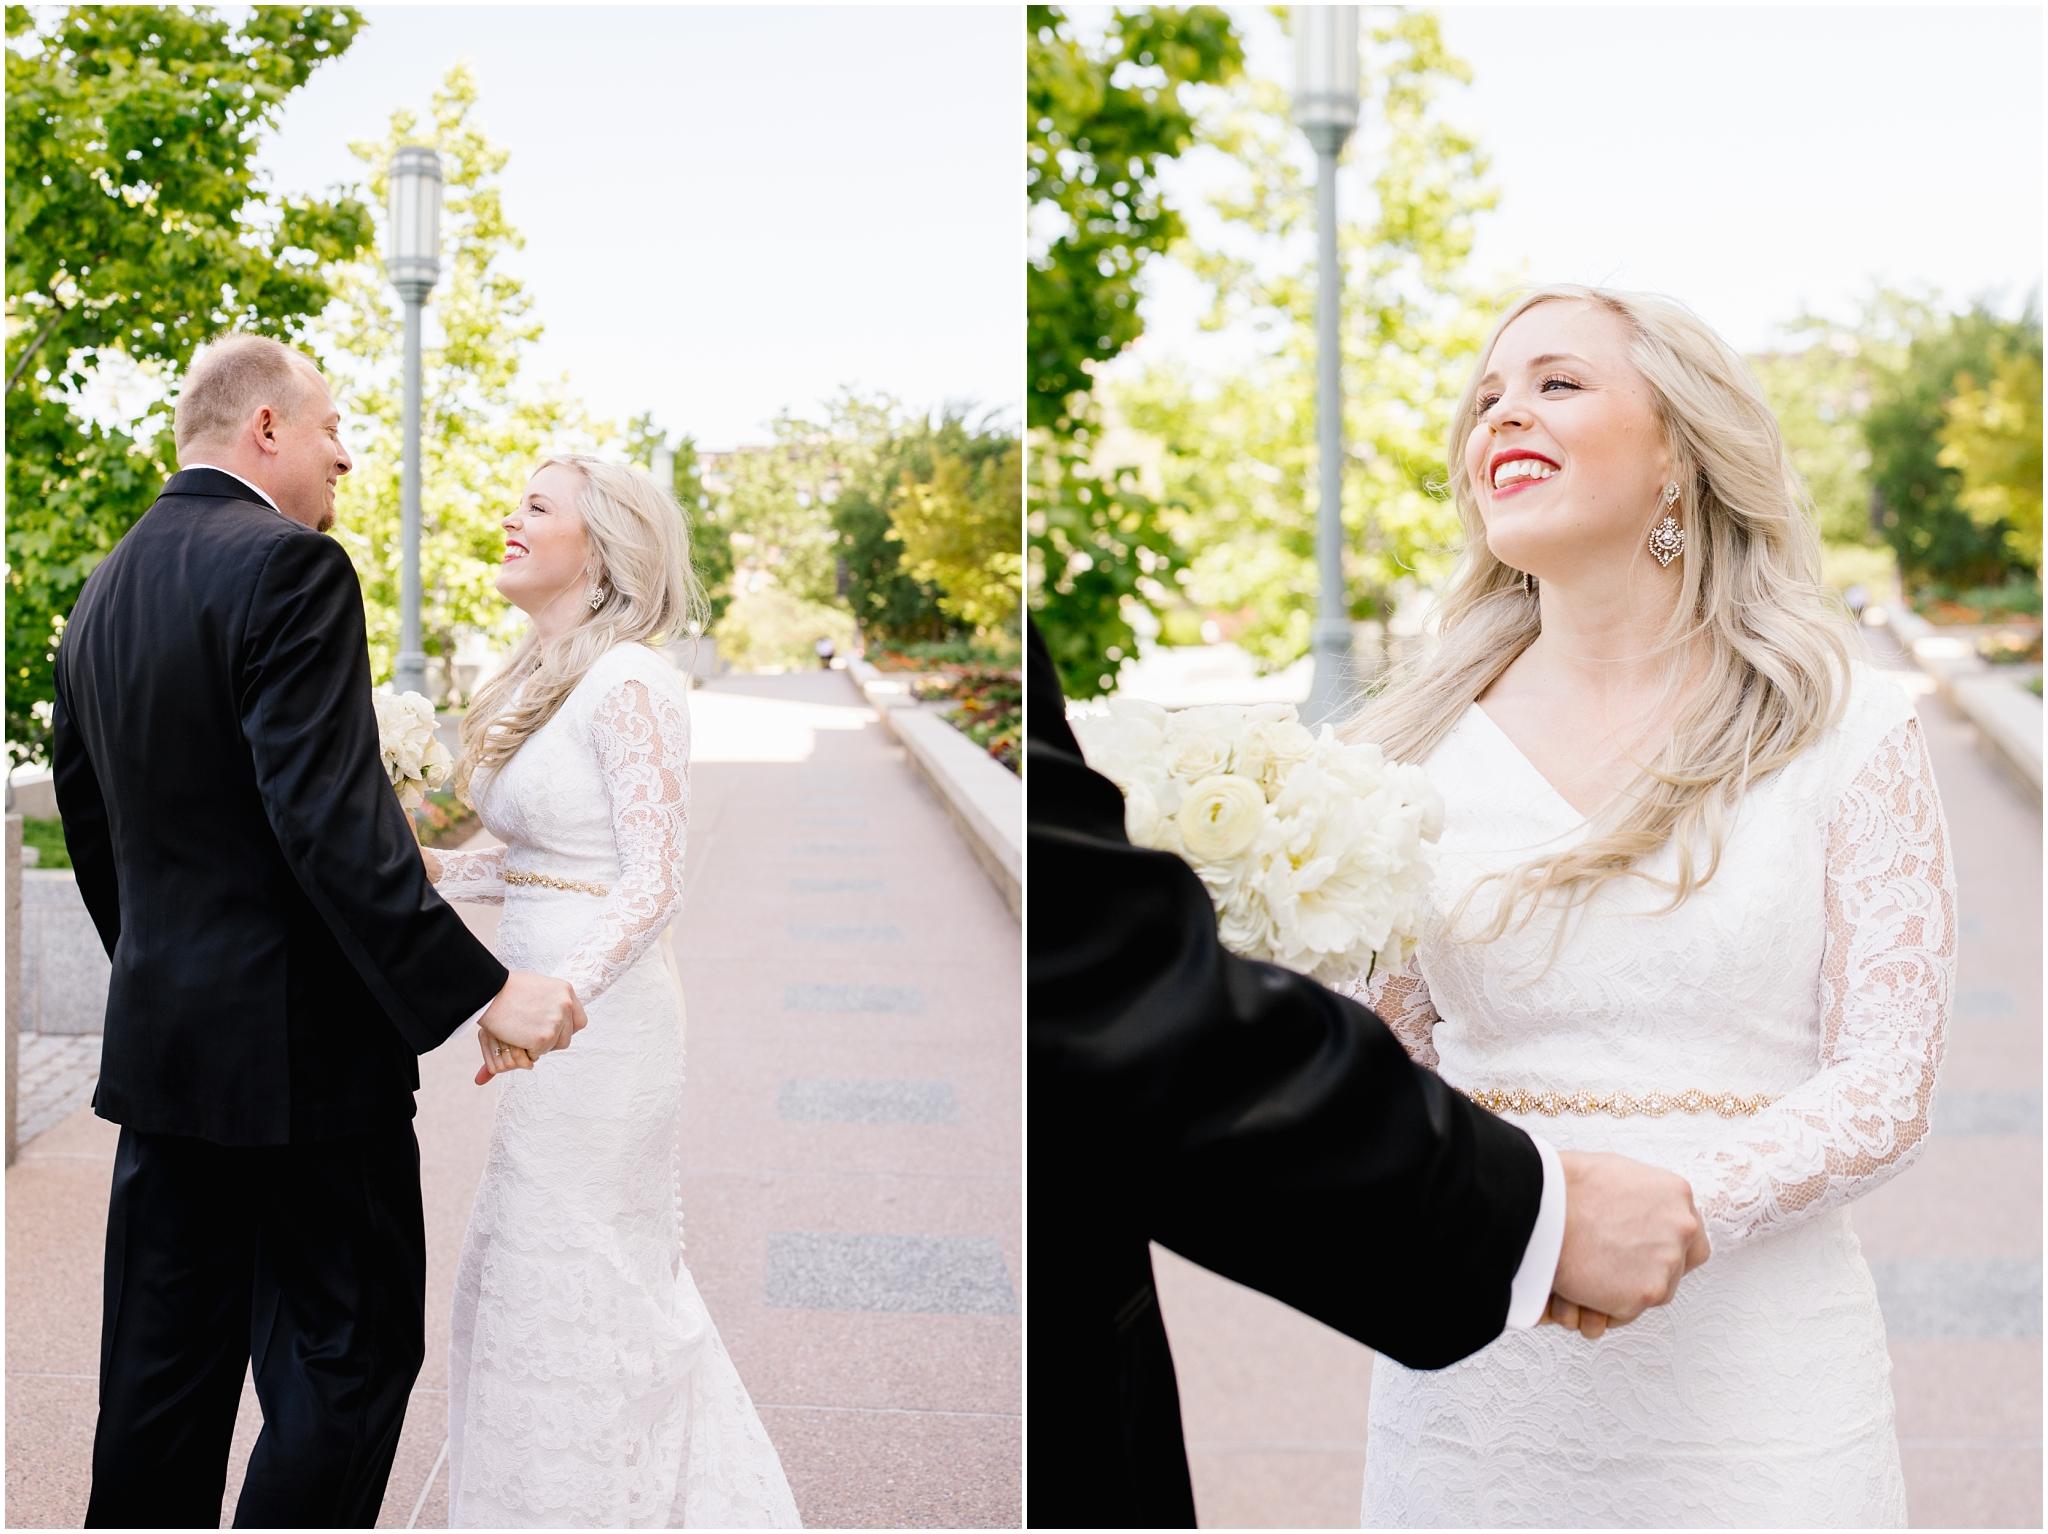 CherylandTyler-249_Lizzie-B-Imagery-Utah-Wedding-Photographer-Salt-Lake-City-Temple-Wells-Fargo-Building-Reception.jpg